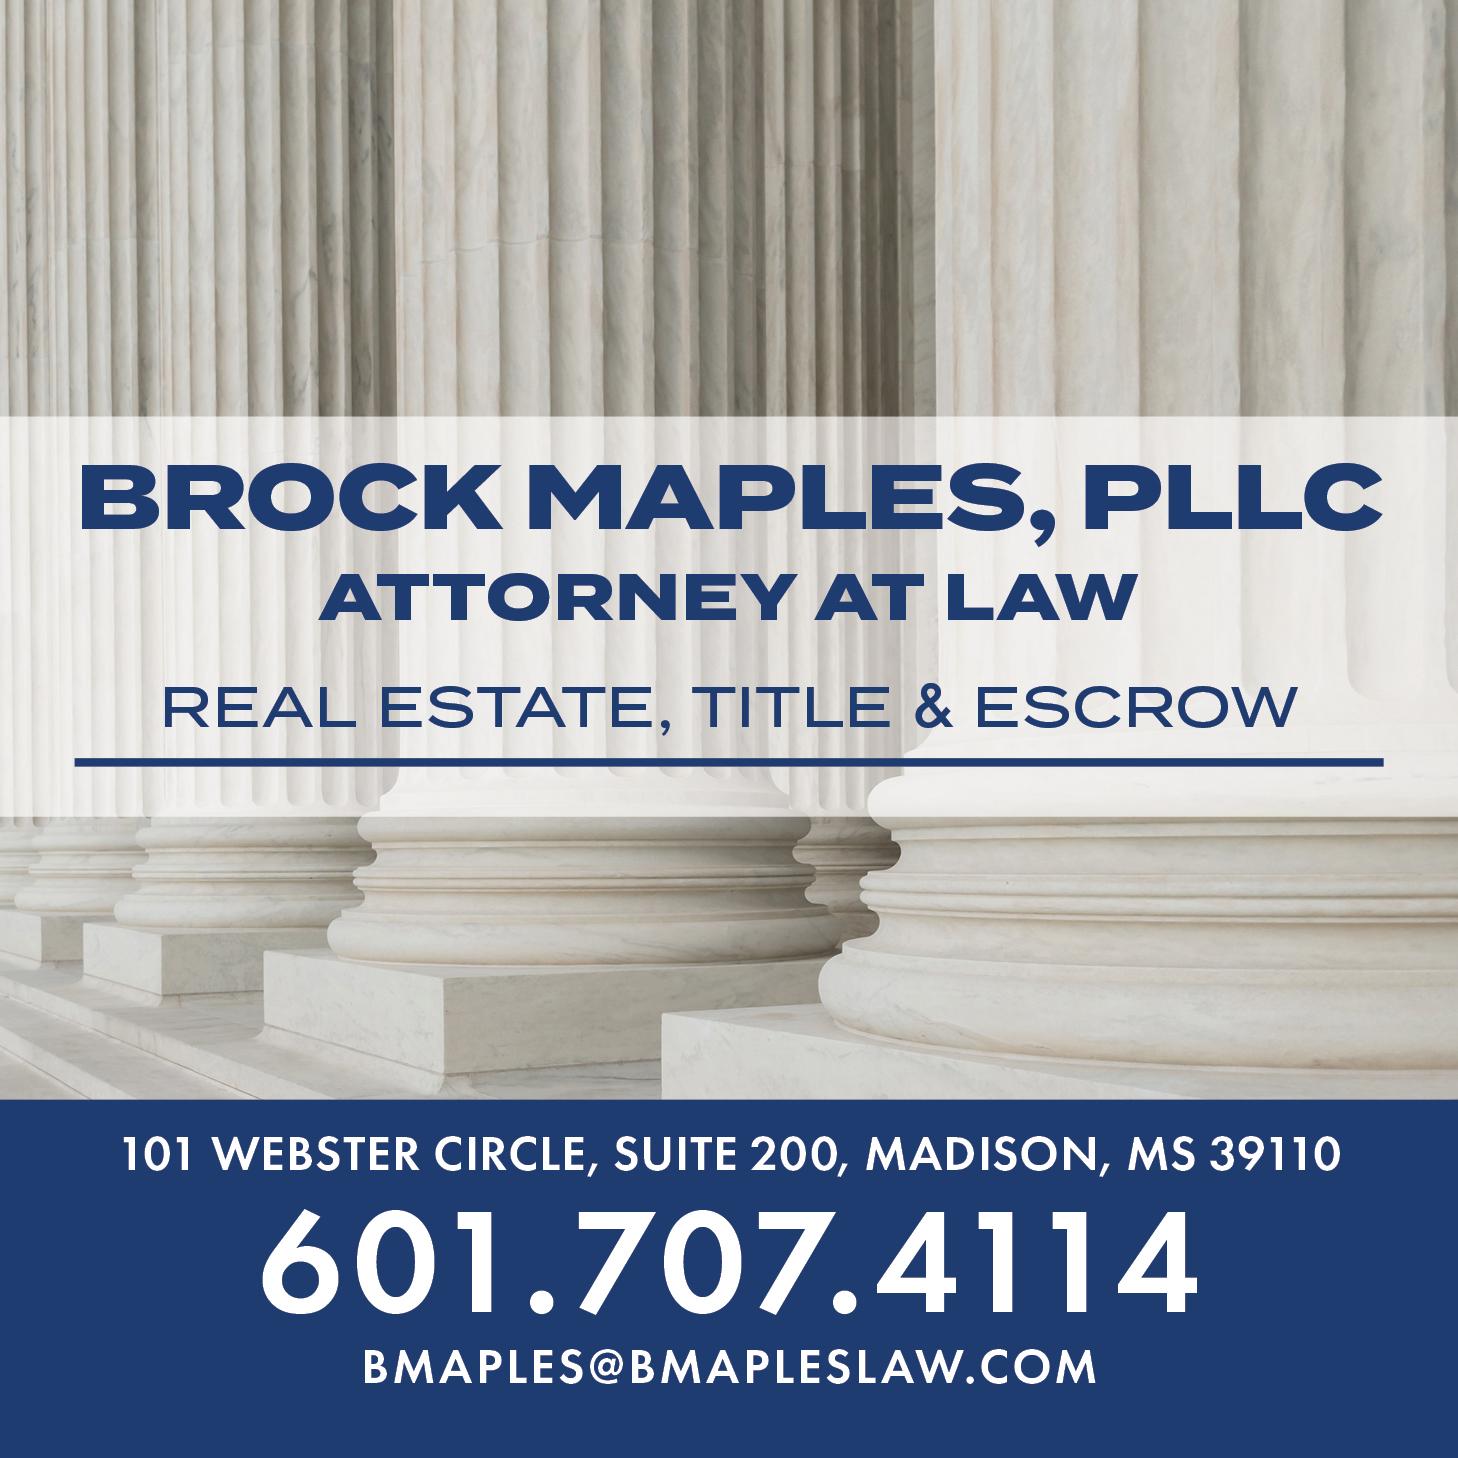 Brock Maples